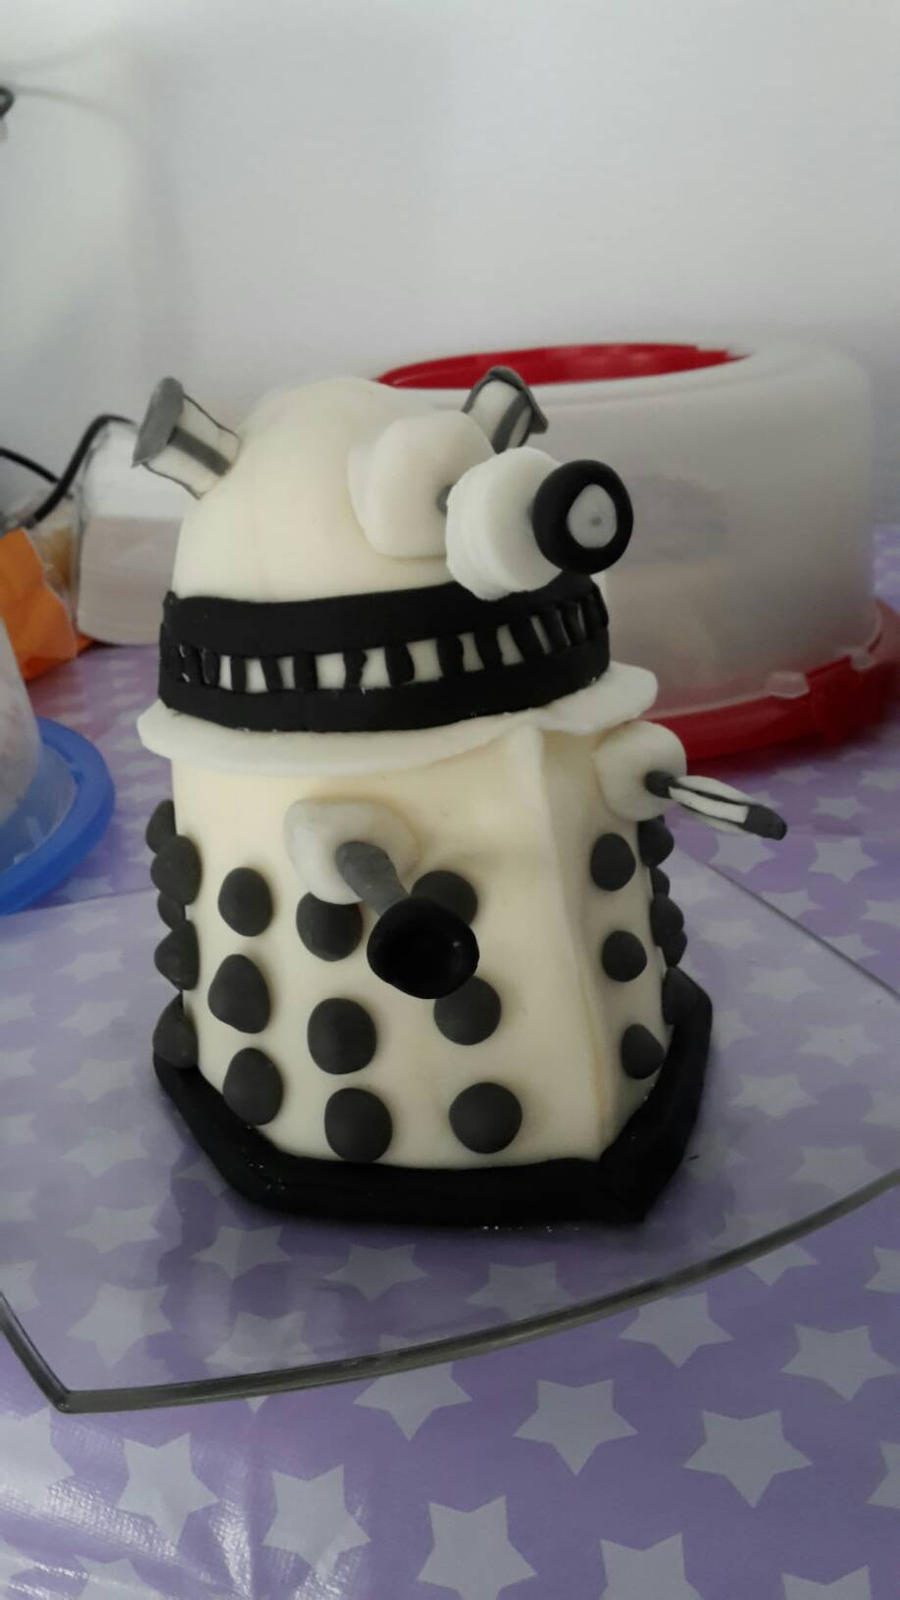 dalek cake by asm2019